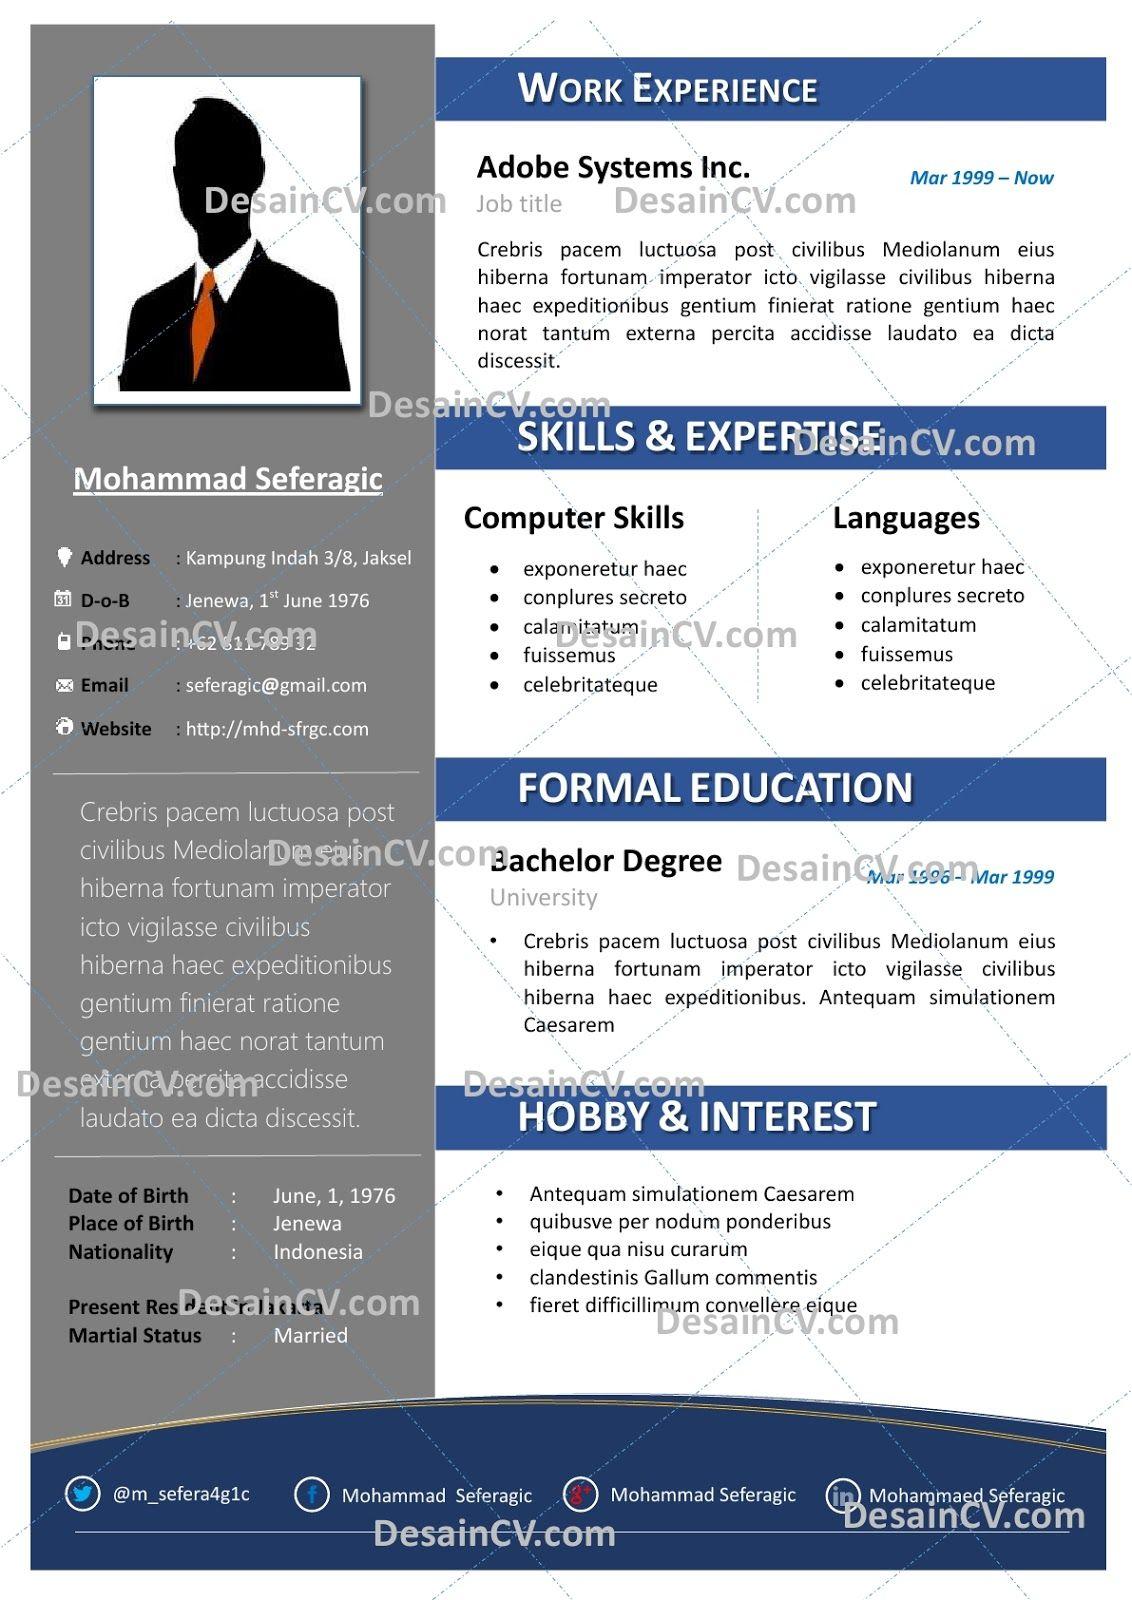 Professional Contoh Curriculum Vitae Resume Template Cv Kreatif Template Photoshop